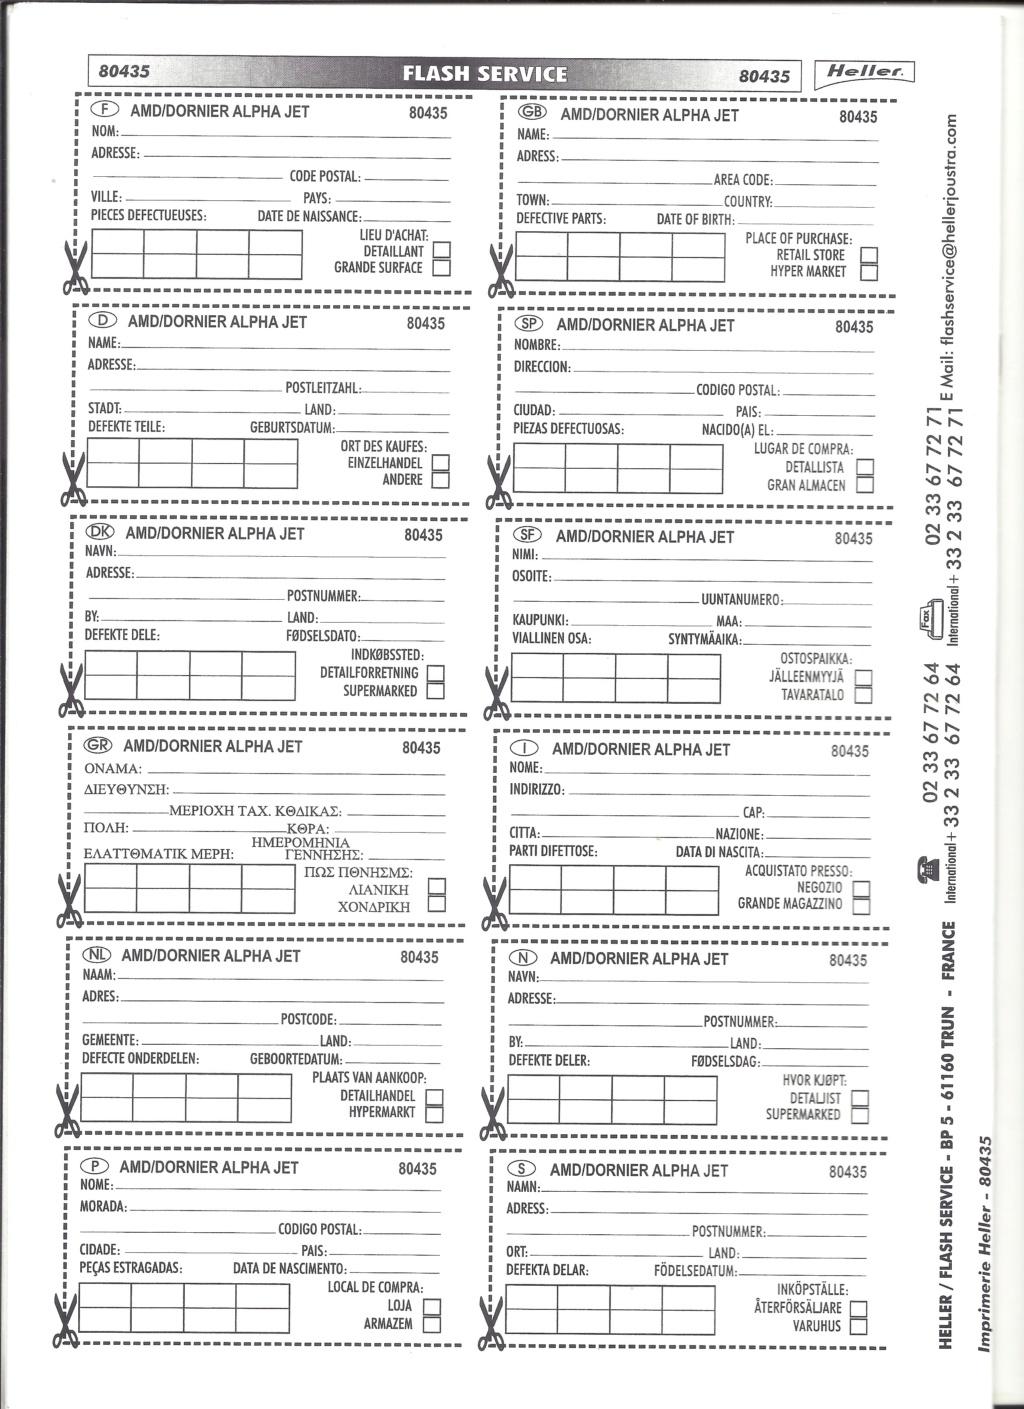 DASSAULT-BREGUET DORNIER ALPHA JET 1/48ème Réf 80435 Notice Helle673